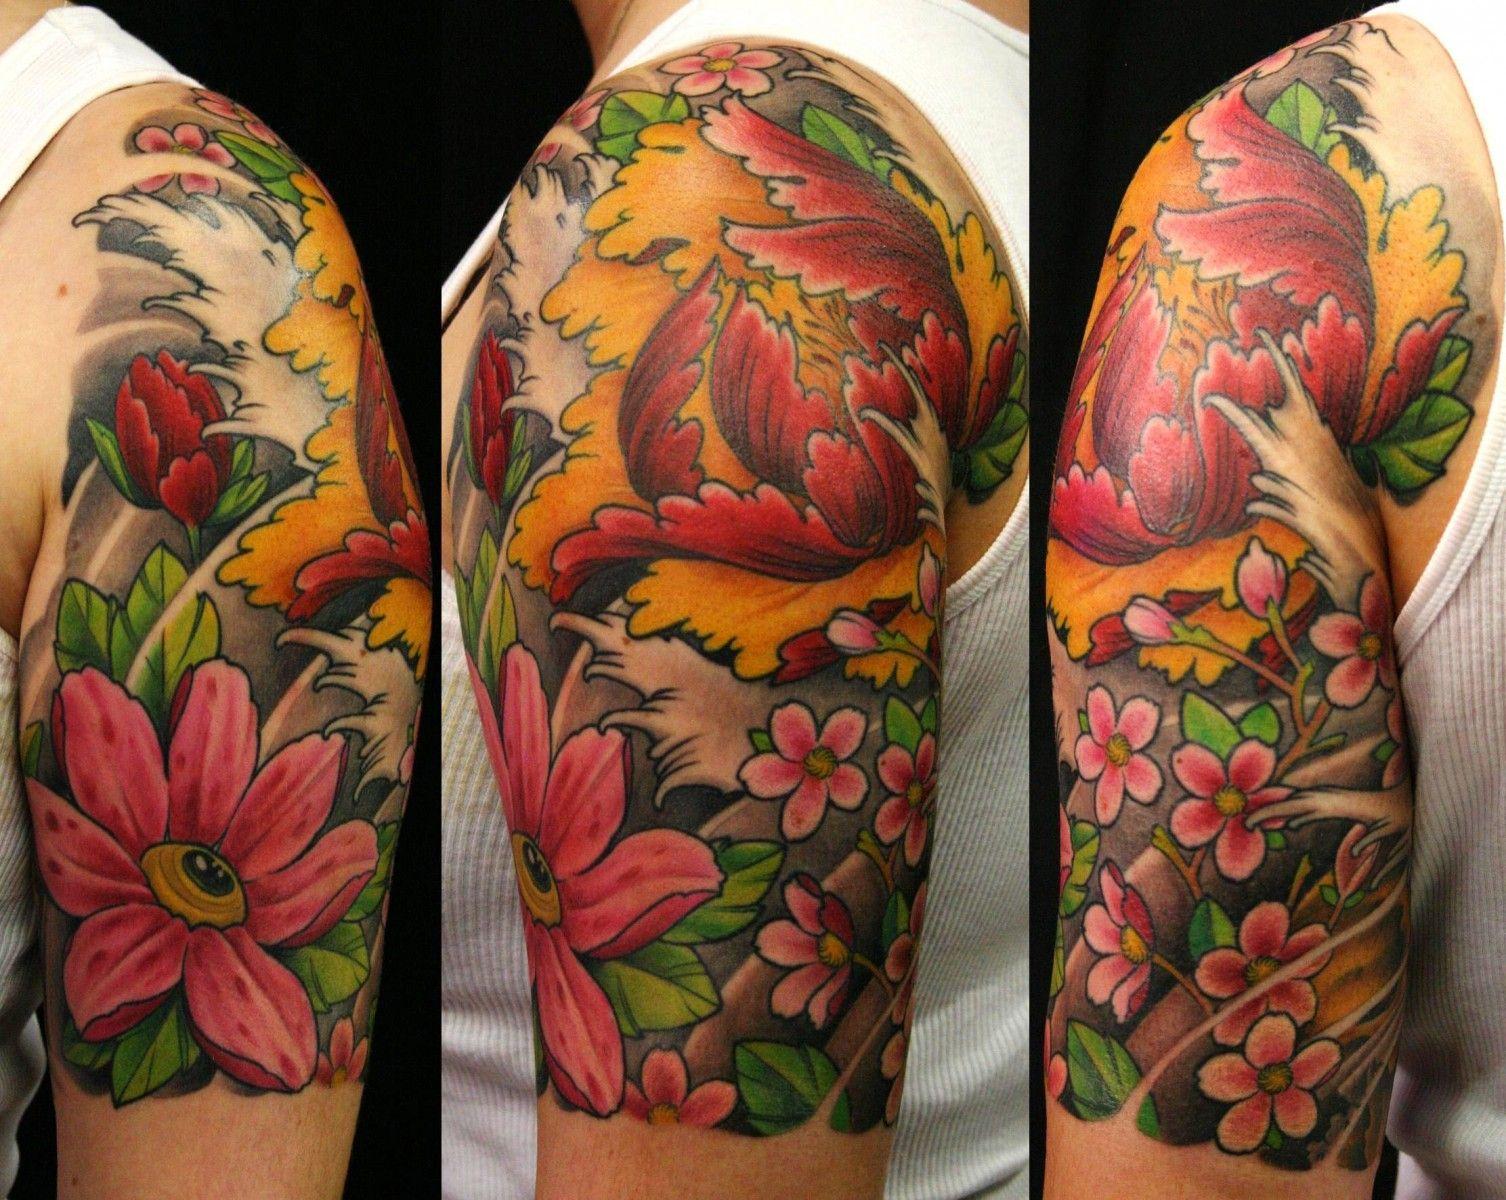 Pin by Chev Chelios on Tattoo | Pinterest | Tatoo, Tattoo and Tatting